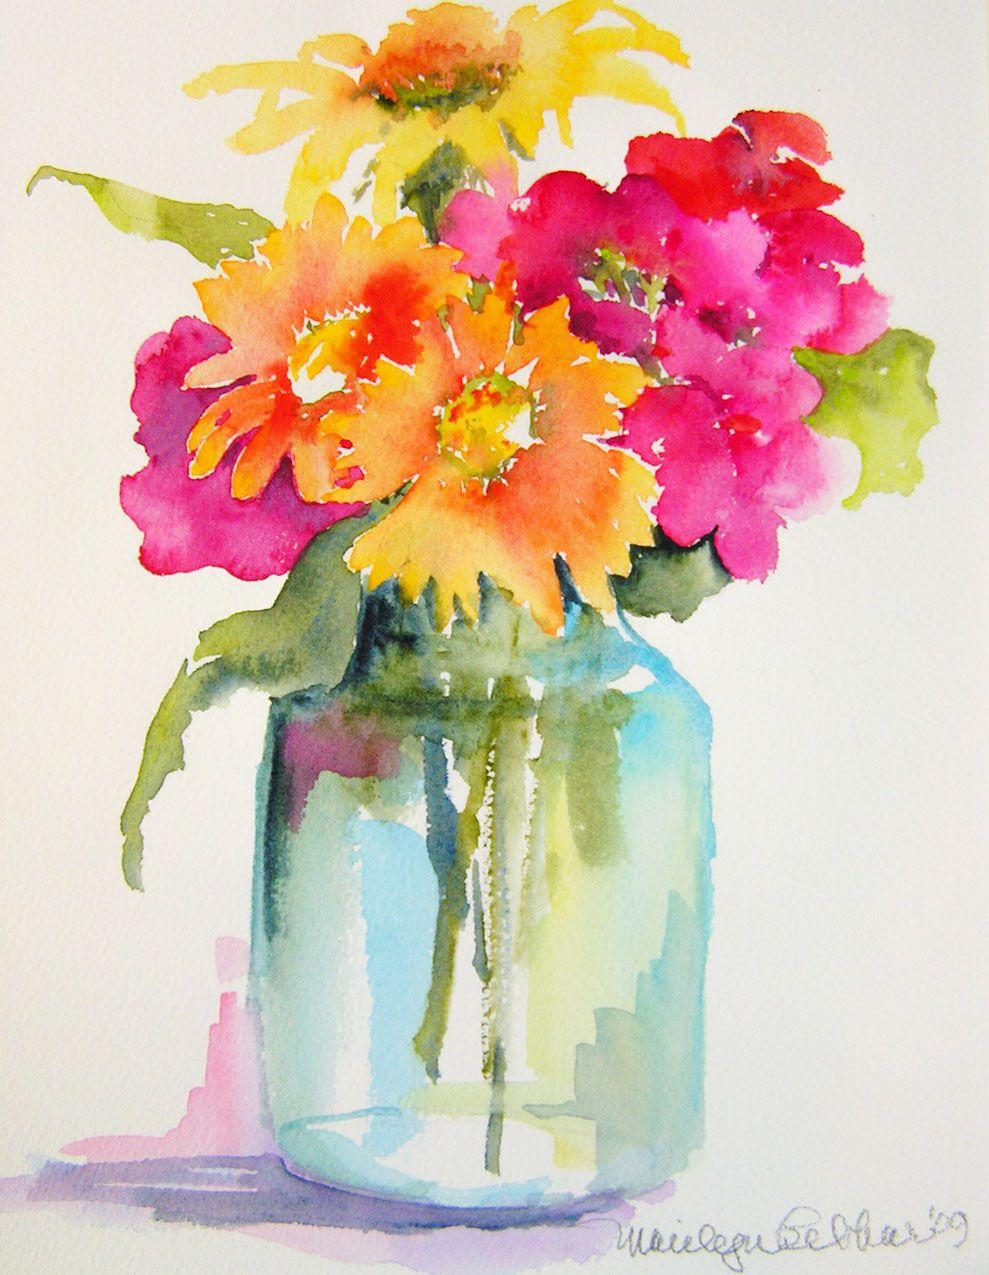 Pink Orange Yellow Flowers In Mason Jar Vase Watercolor By